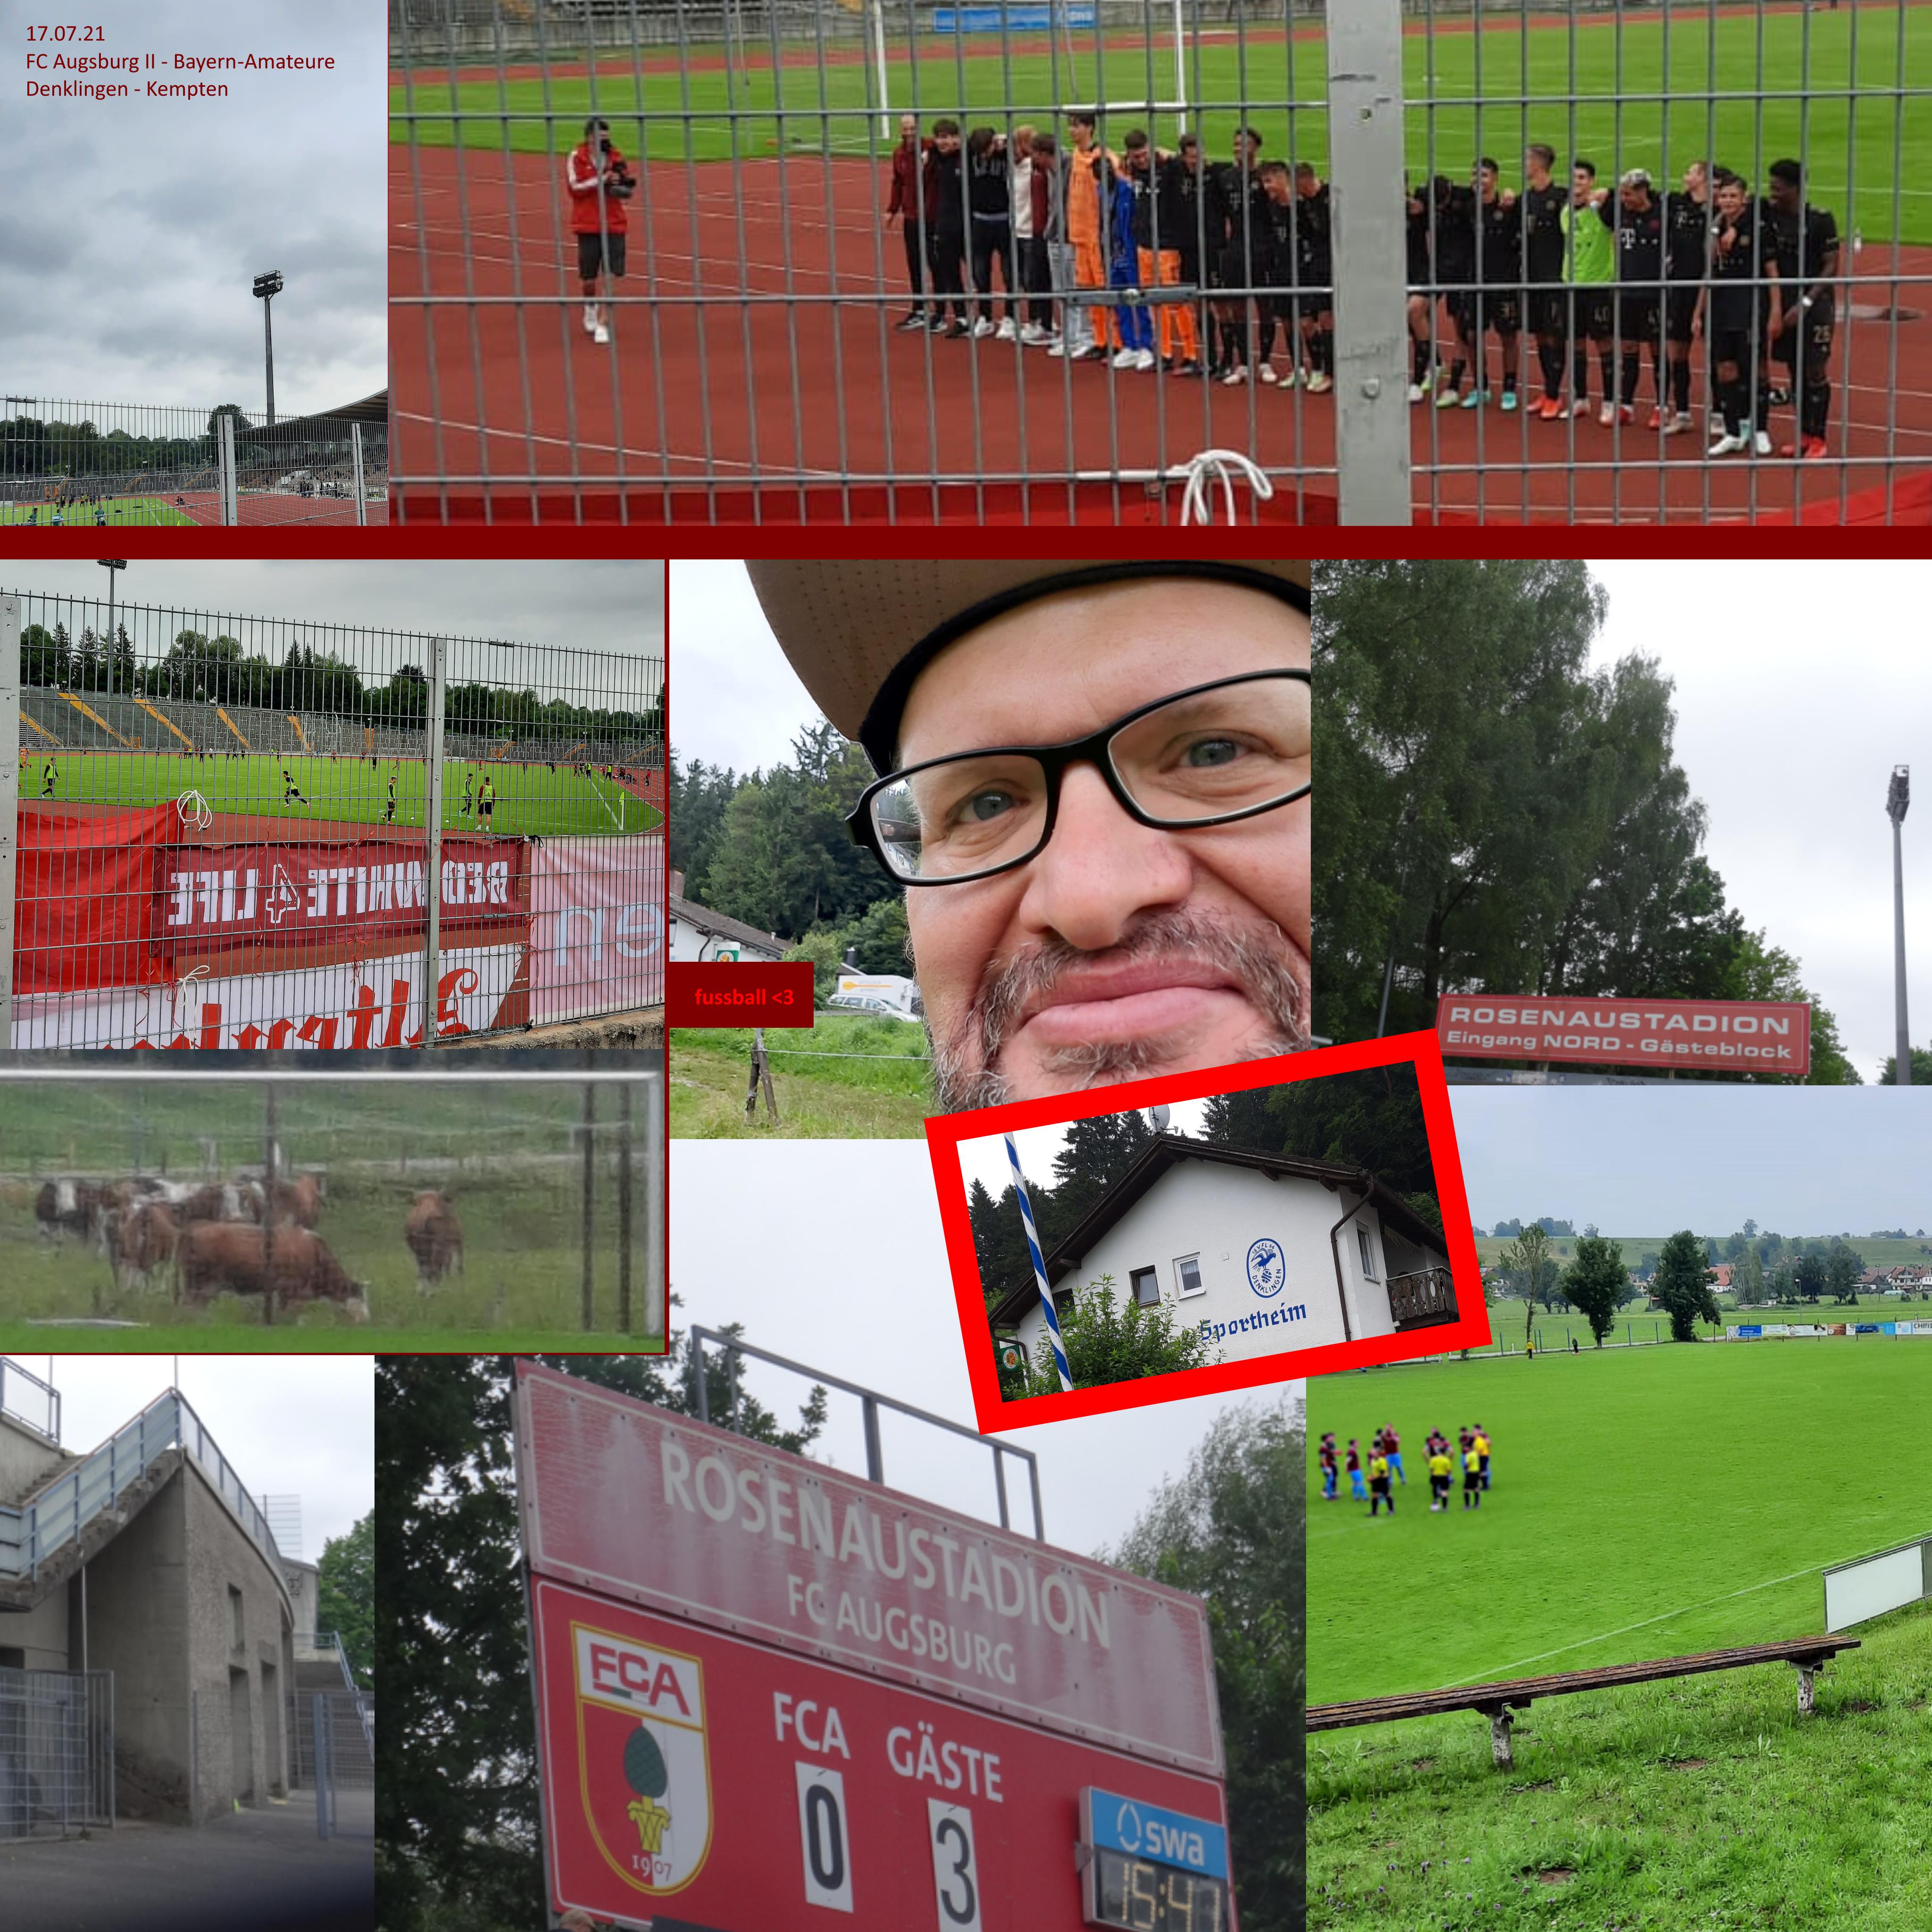 17.07.201: FC Augsburg II - Bayern-Amateure + Denklingen - Kempten!